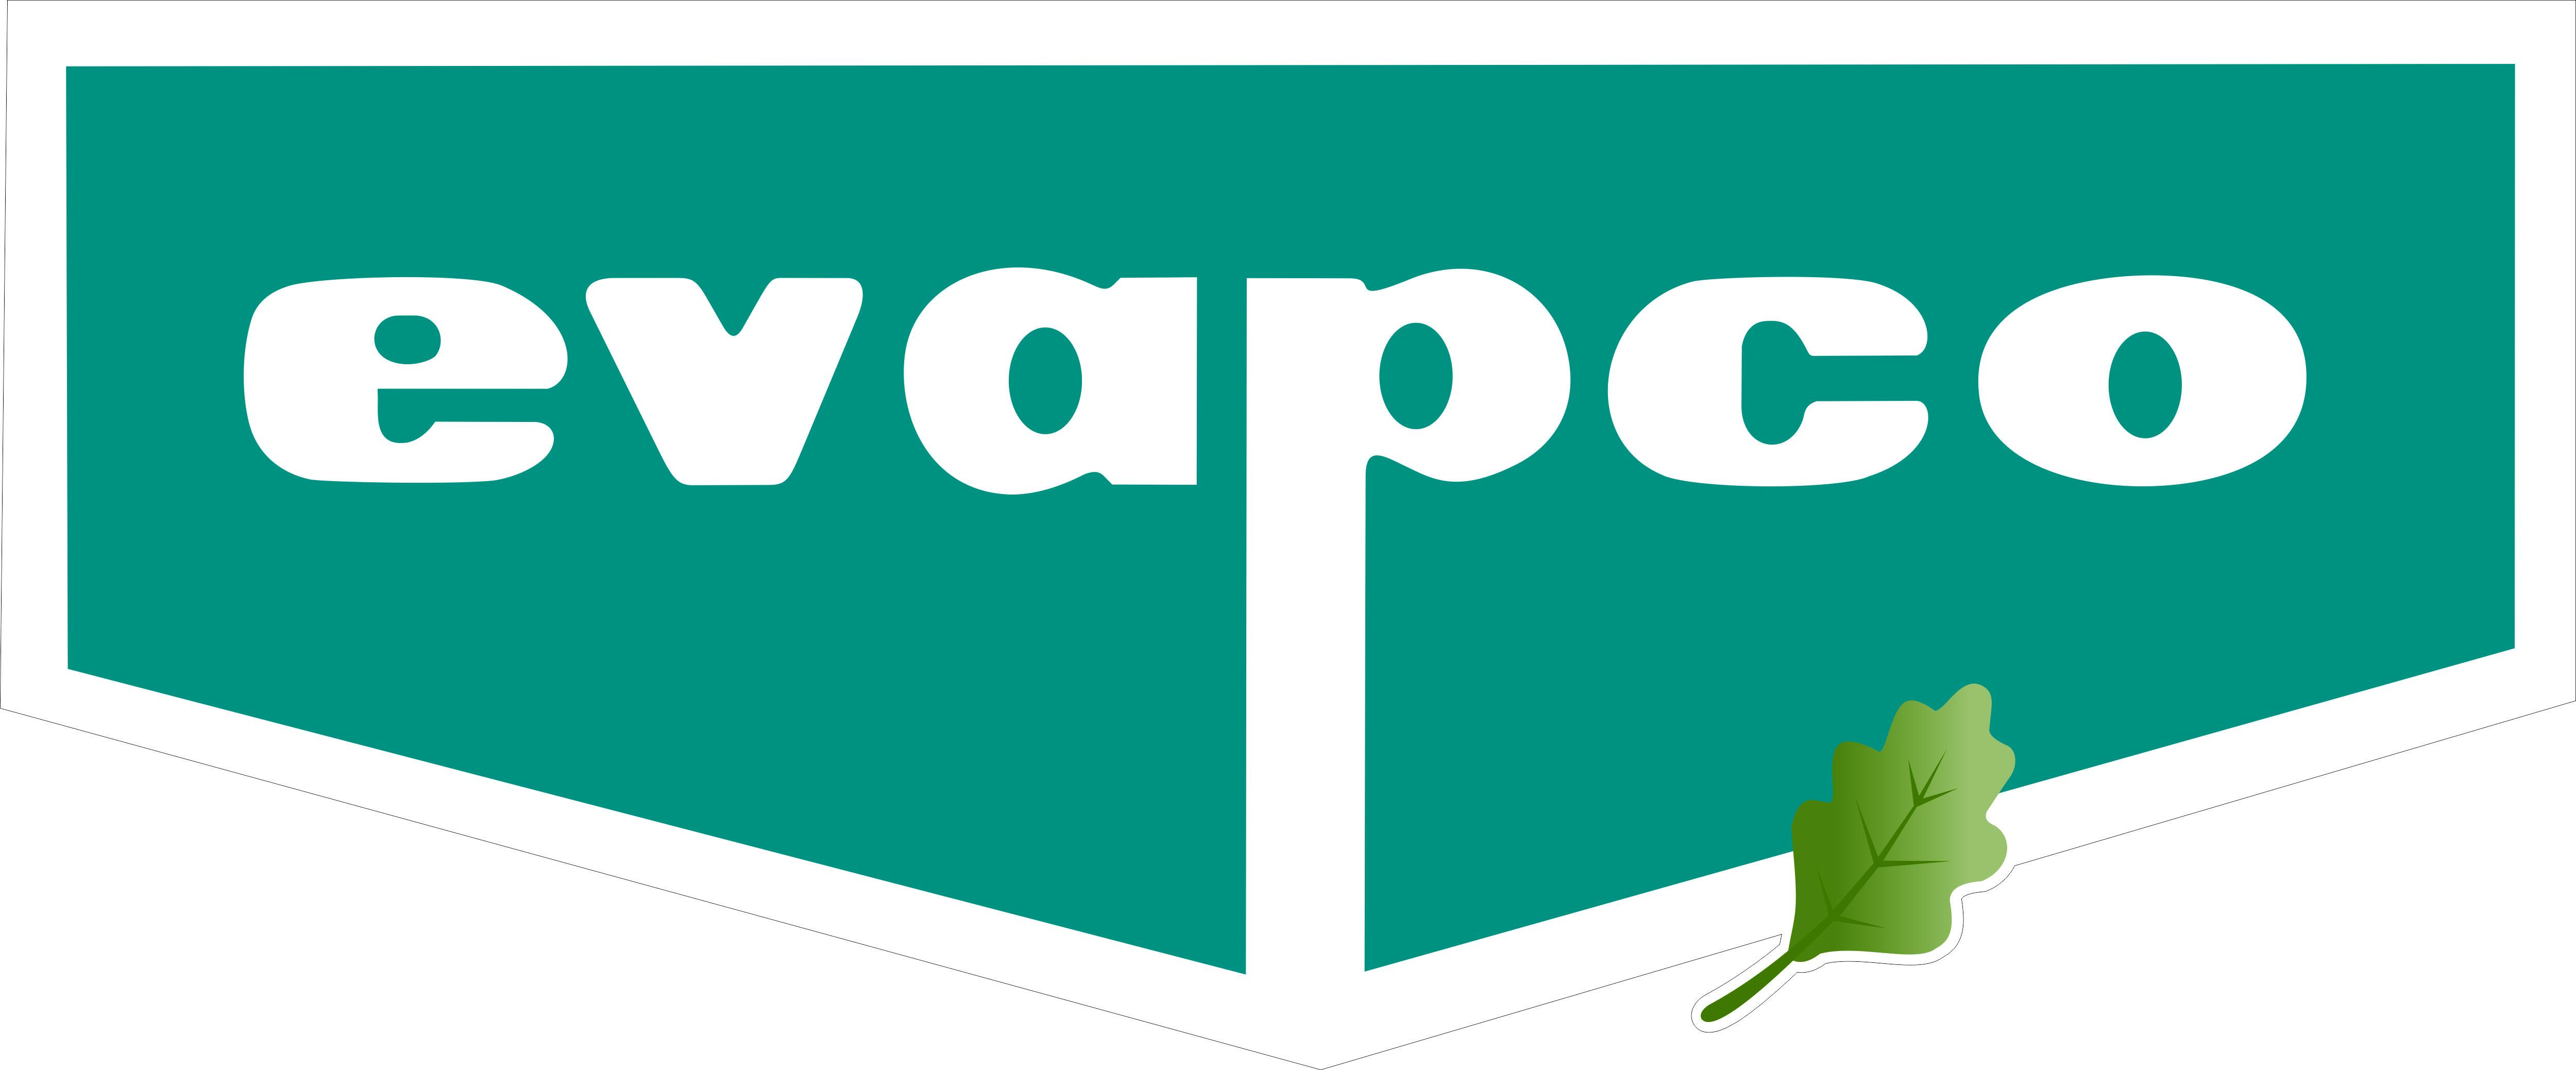 Contact Us Petroleum Coke Company Pty Ltd Mail: Evapco S A (Pty) Ltd On M2North